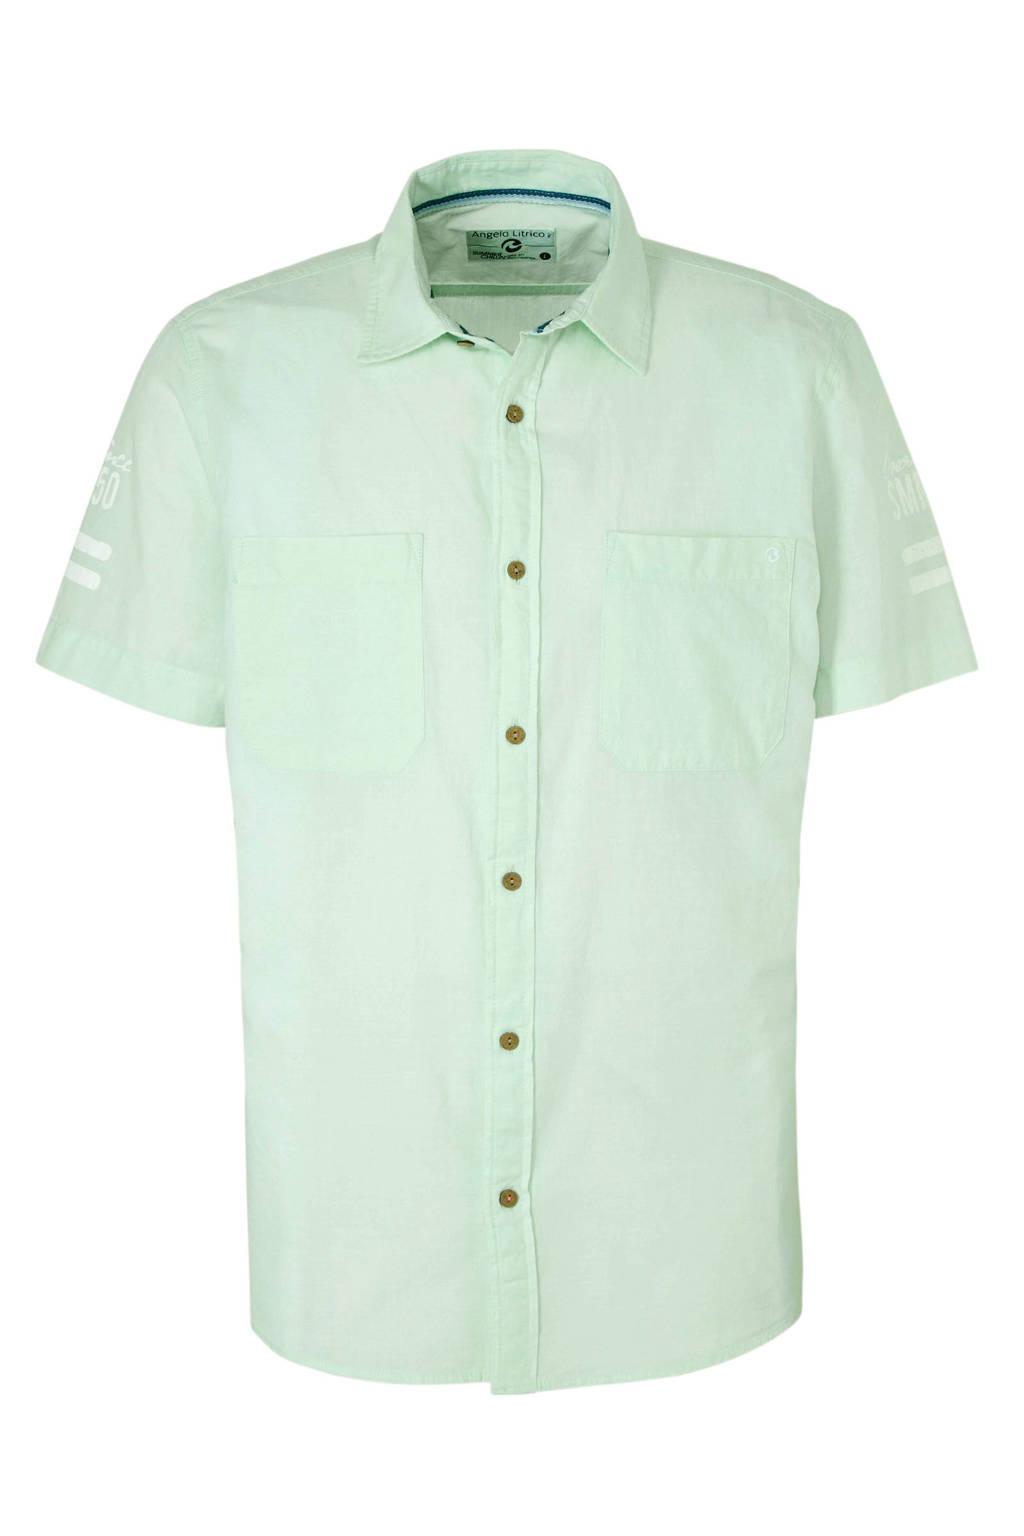 Overhemd Mintgroen.C A Angelo Litrico Overhemd Mintgroen Wehkamp